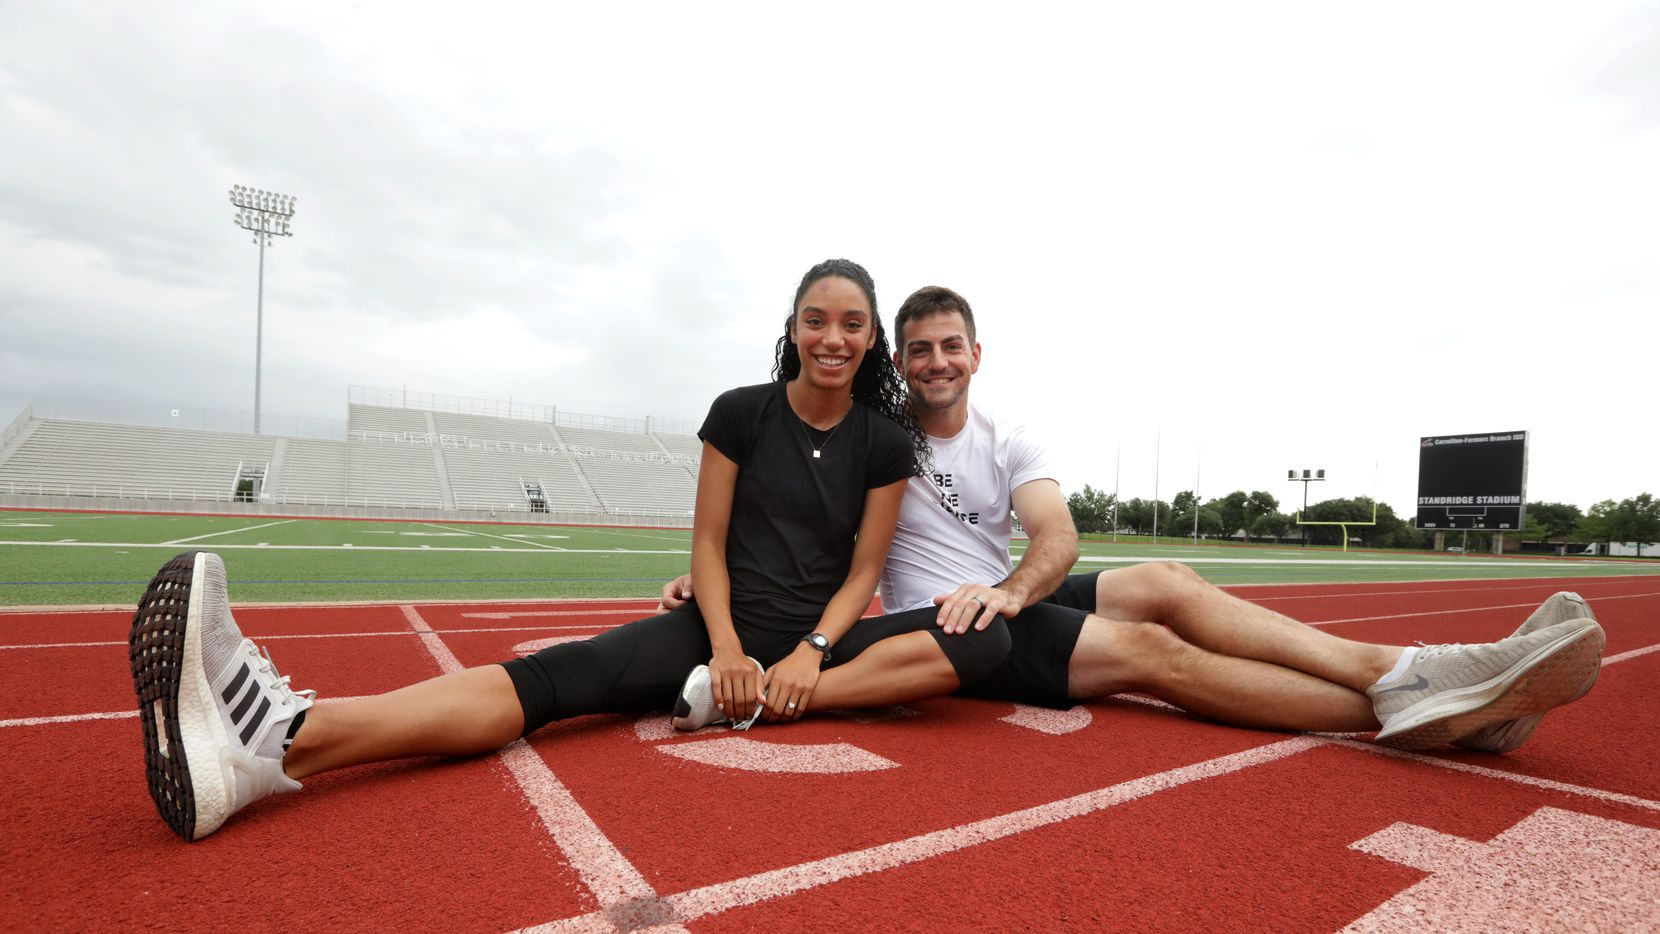 Melissa Gonzalez, left, and David Blough pose for a photograph at Standridge Stadium in Carrollton, TX, on Jul. 2, 2021.